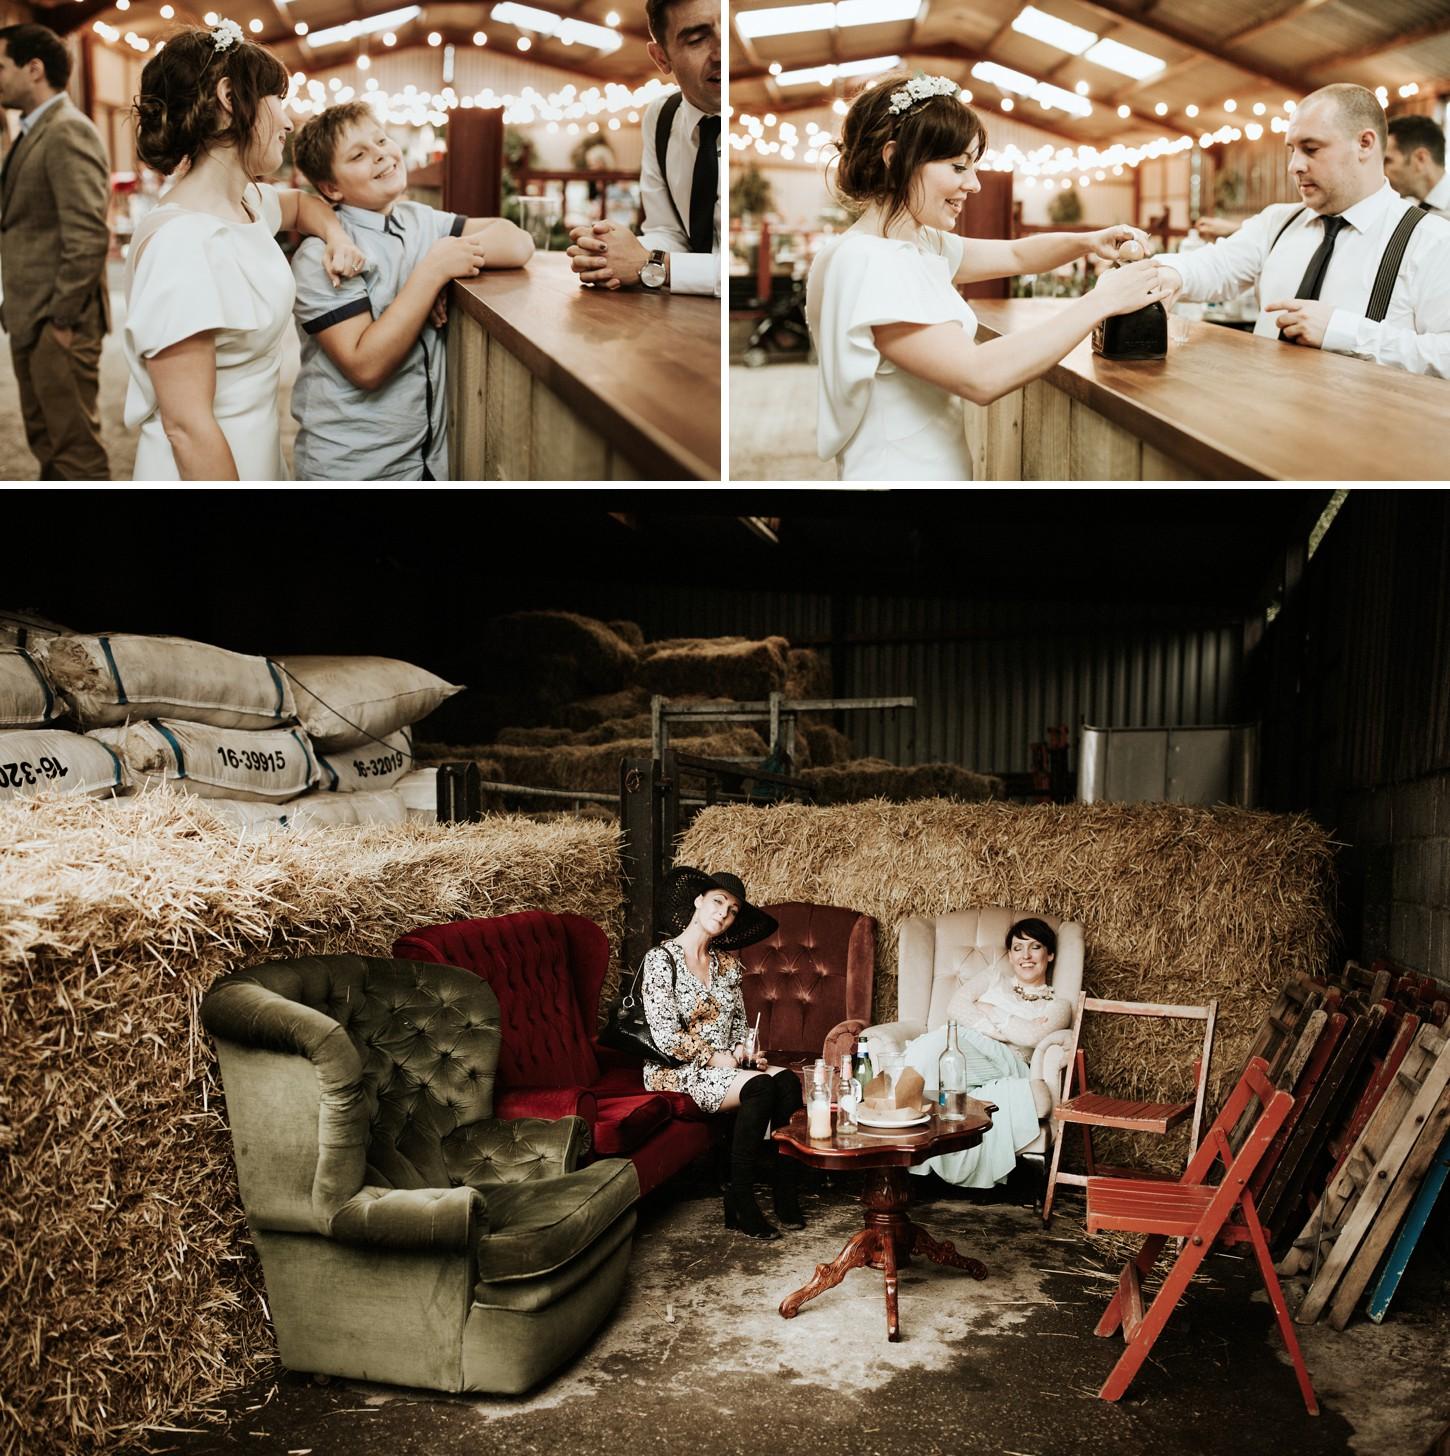 Dolau-Sheep-Farm-Wedding-Wales-United-Kingdom-067